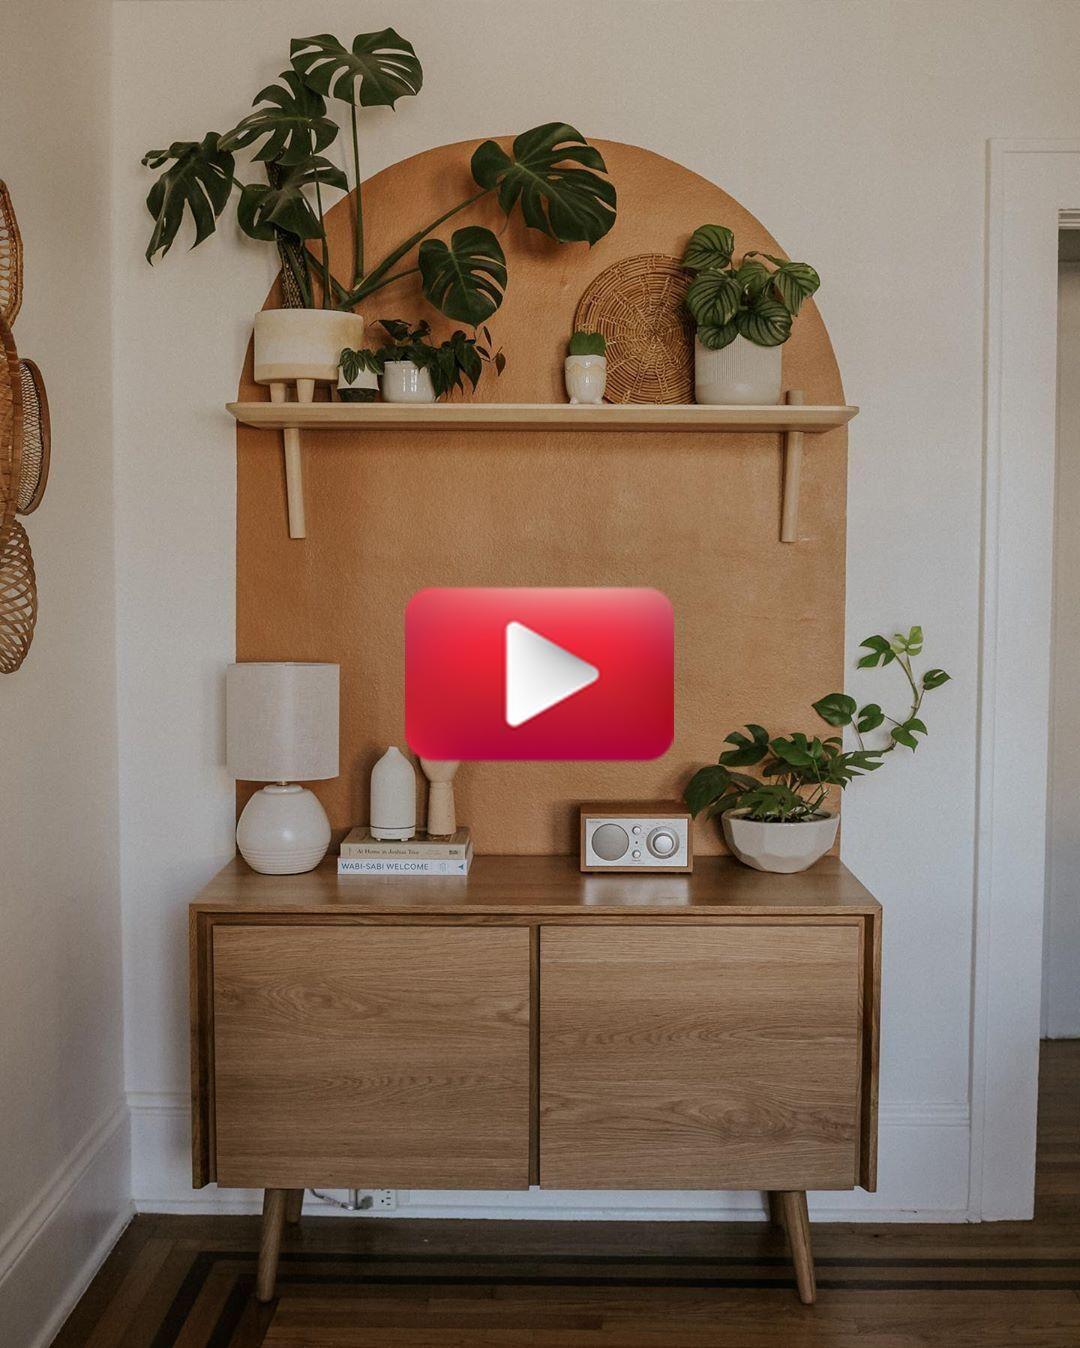 Goedkoop Decor Accessoires Bedroom Saleprice 17 In 2020 Home Decor Home Living Room Room Decor